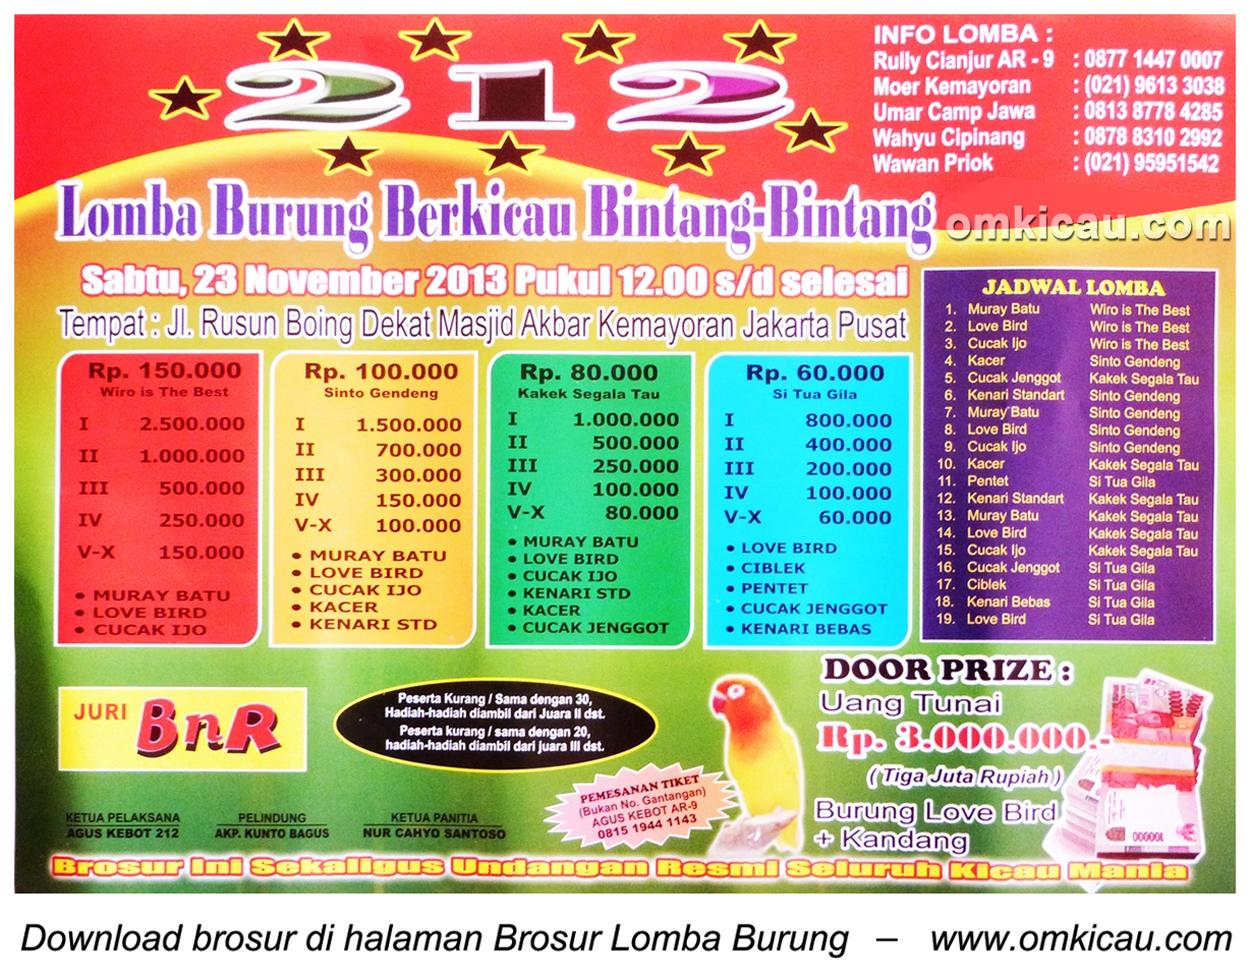 Brosur Lomba Burung Berkicau Bintang-Bintang, Jakarta, 23 November 2013